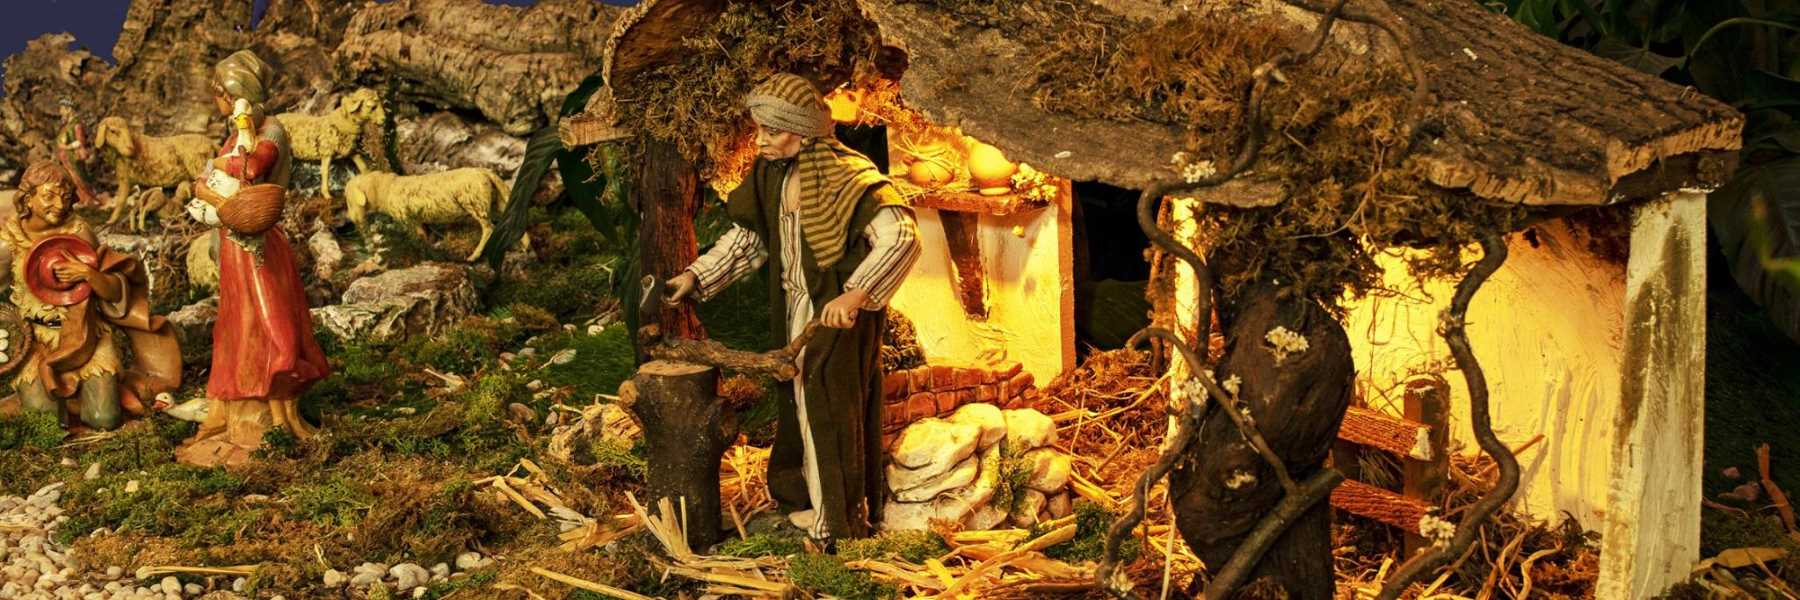 Mechanical Nativity scene